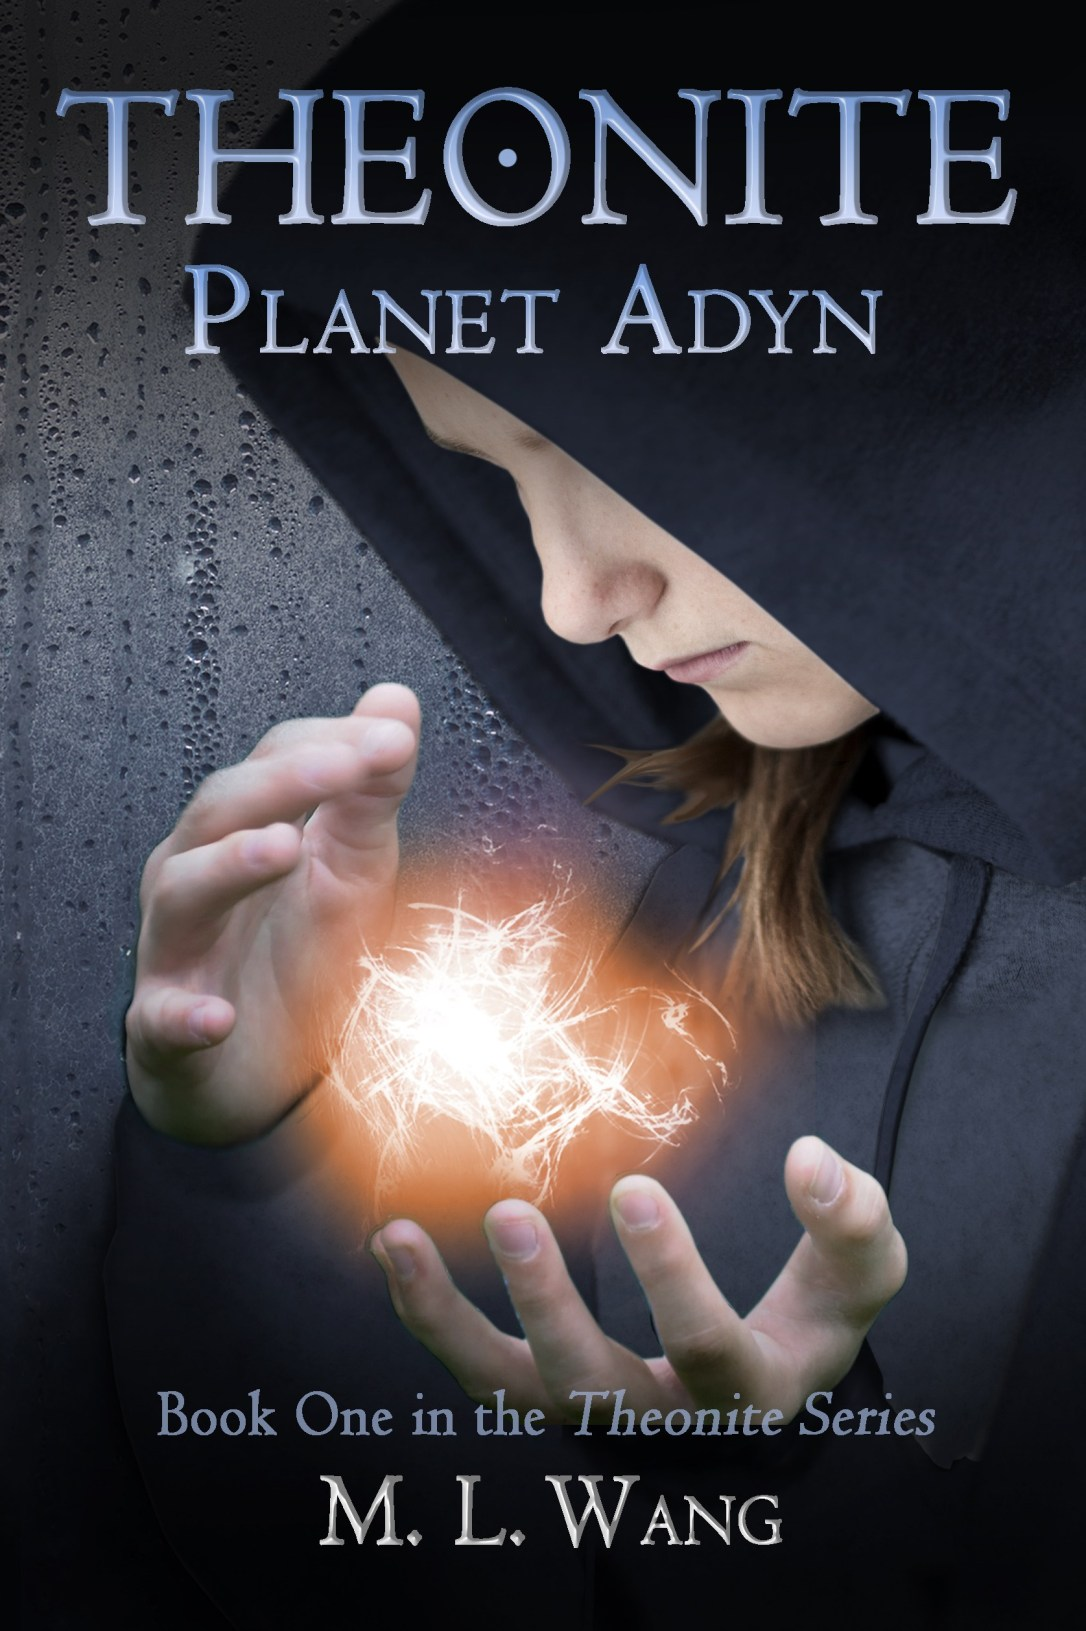 Theonite: Planet Adyn by M. L. Wang